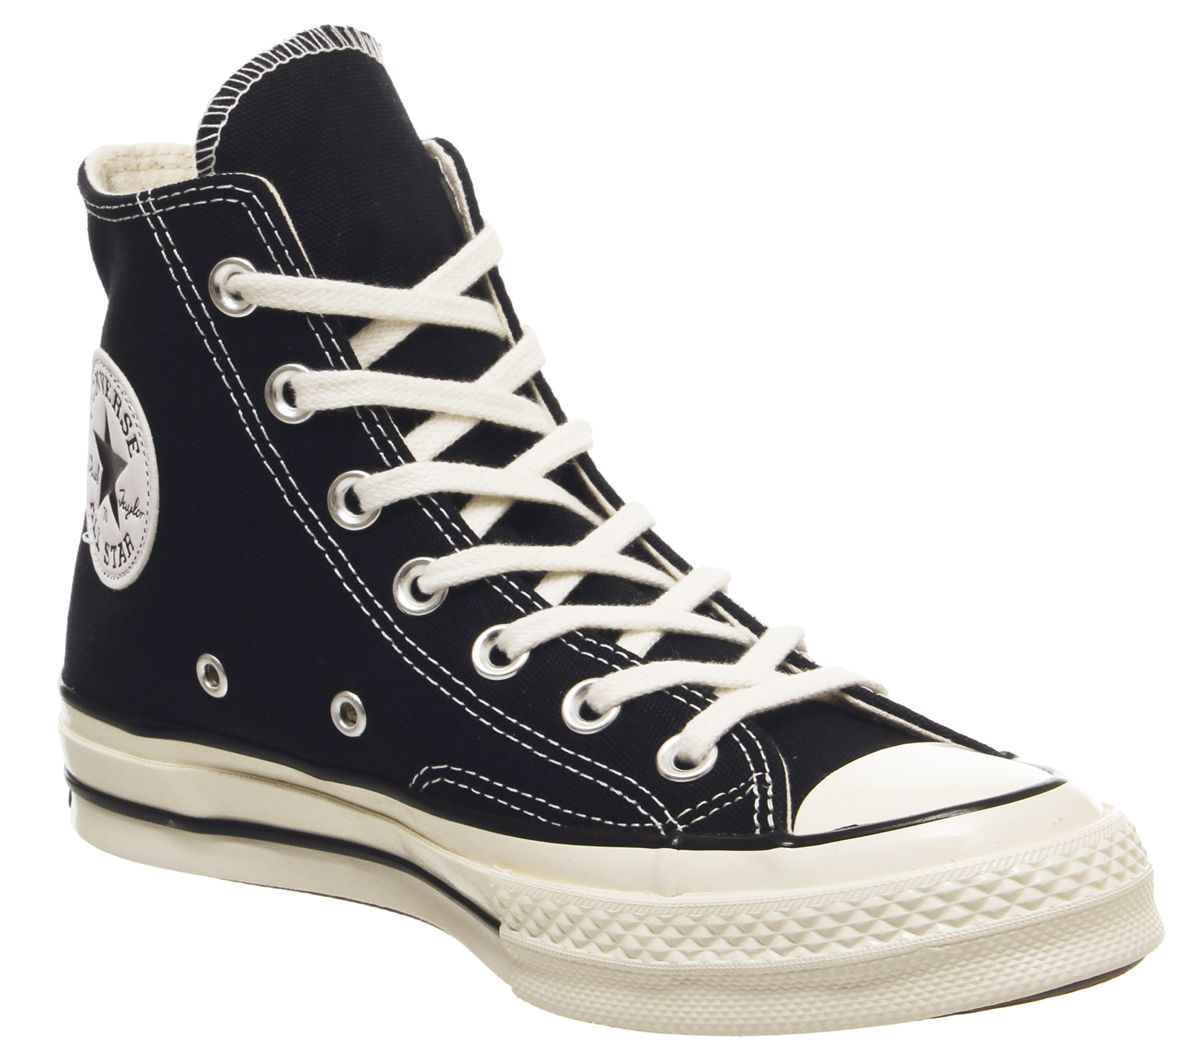 3ae1fc1f6 Converse All Star Hi 70's Black - His trainers